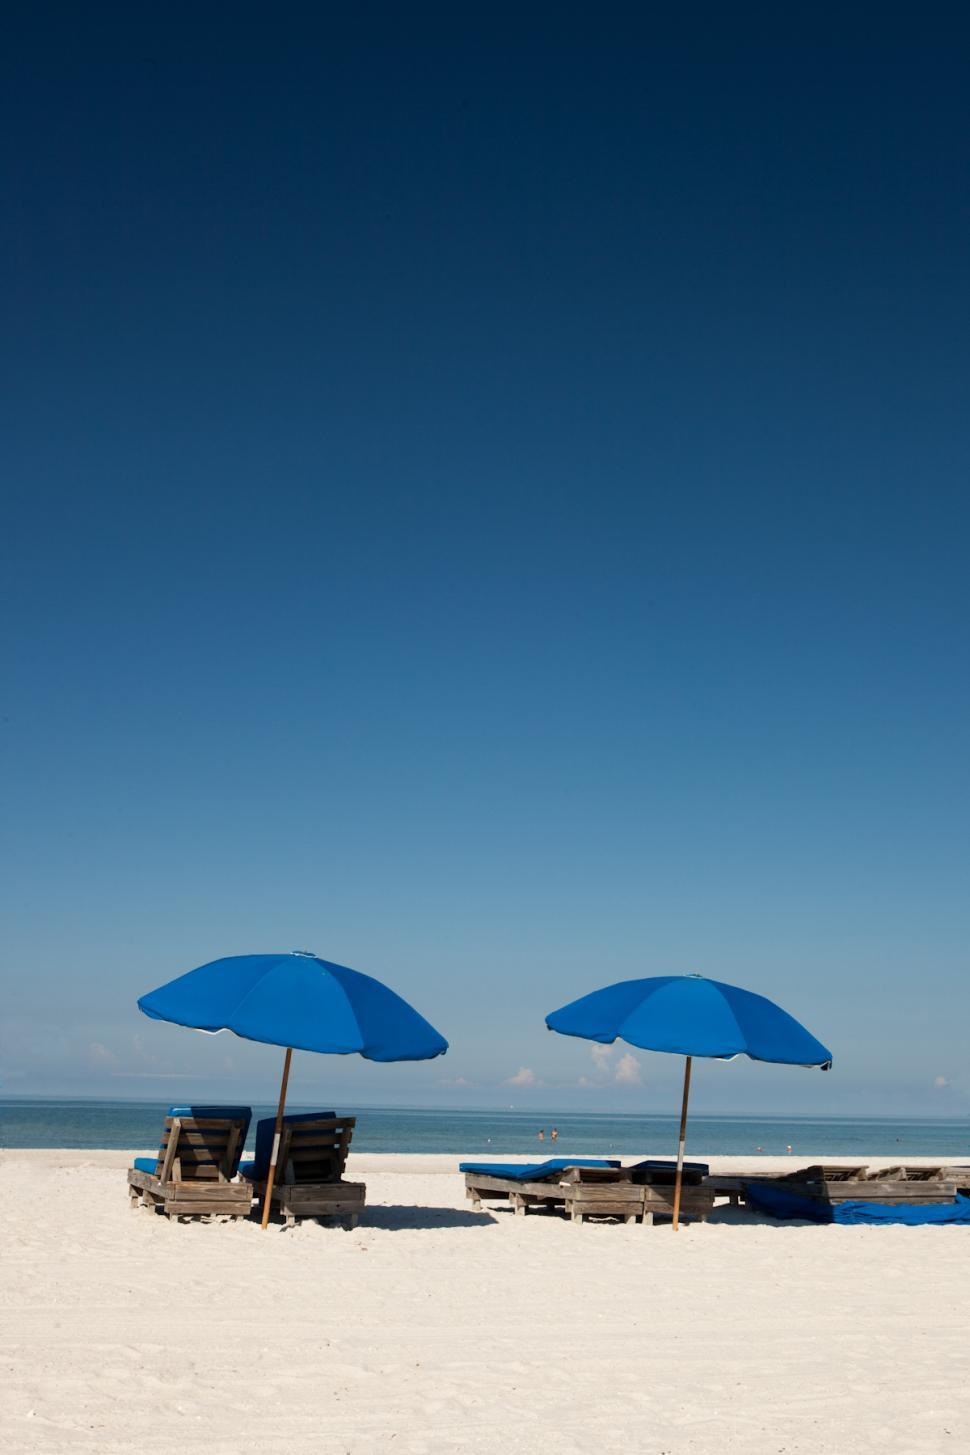 Download Free Stock Photo of Florida Beach Scene